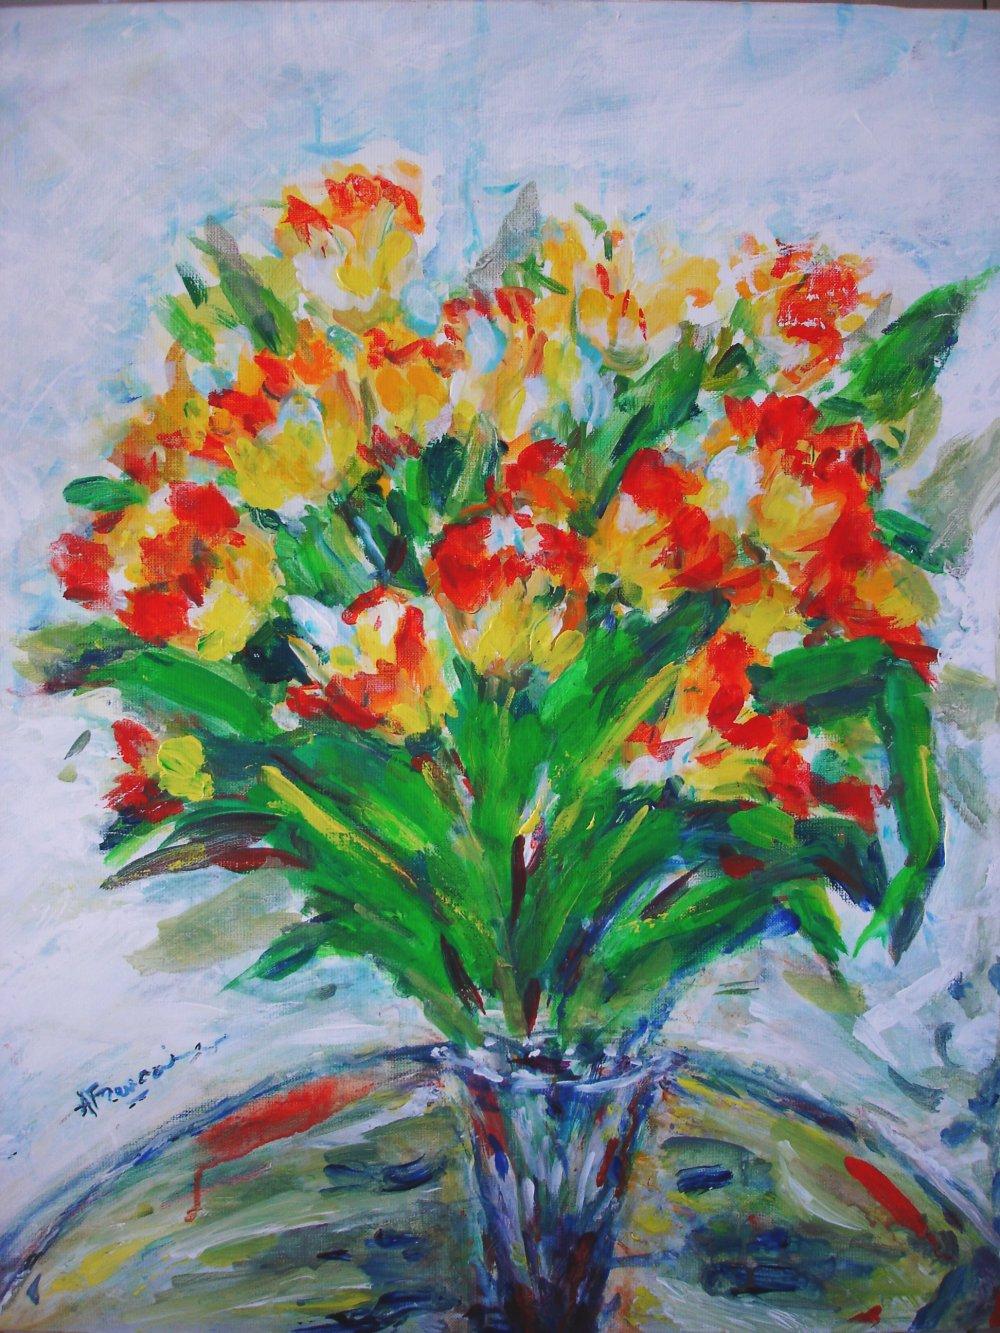 Les Tulipes - acrylique